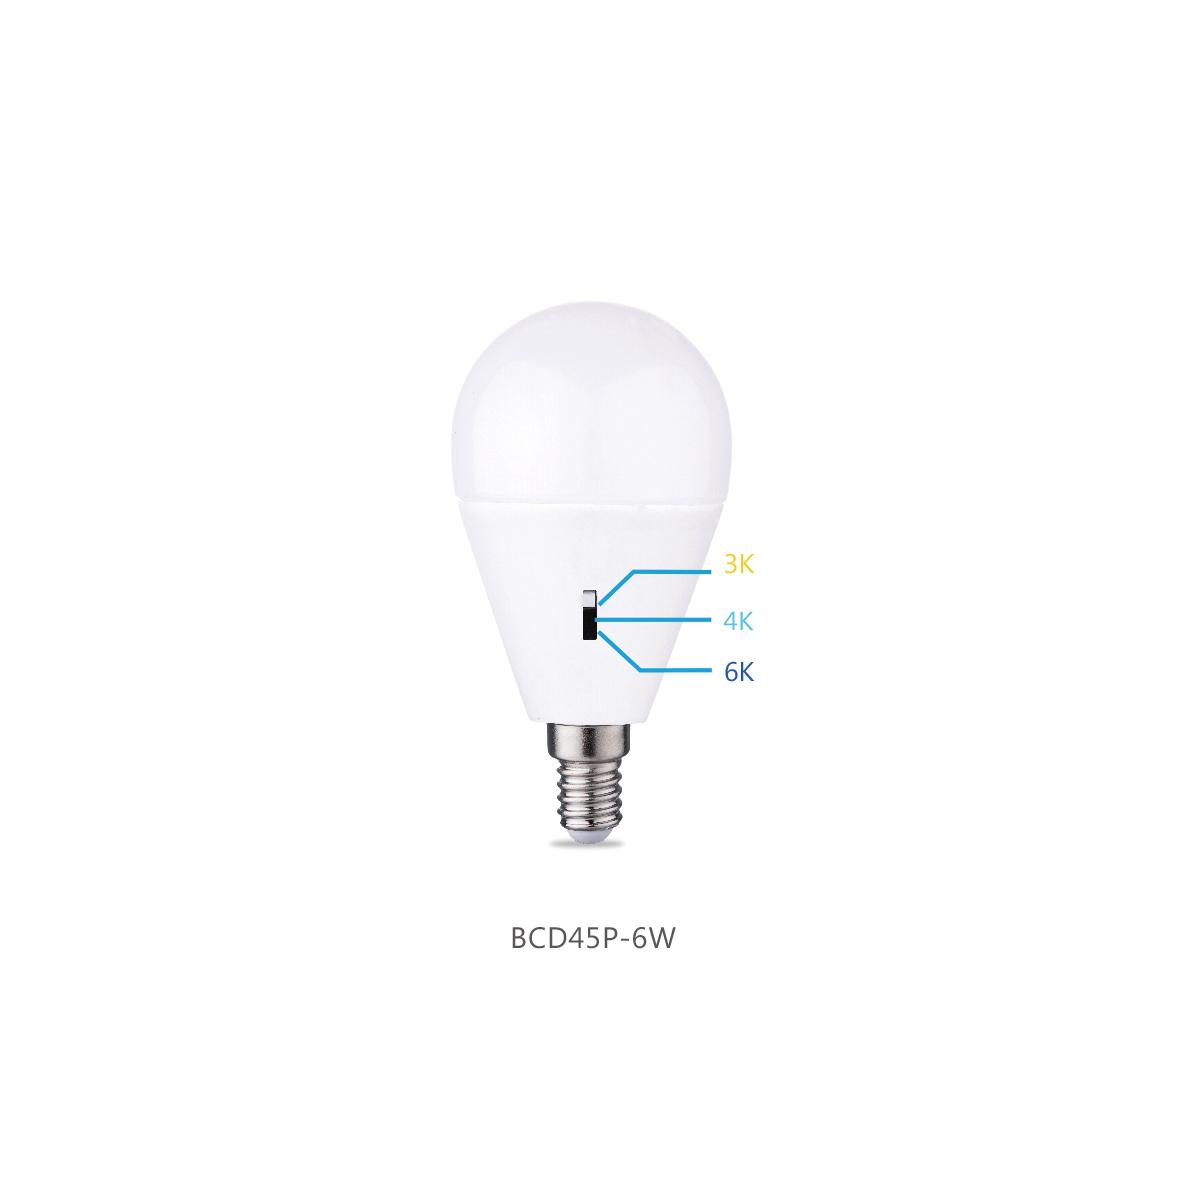 3CCT Patent Bulb BCD45P-6W